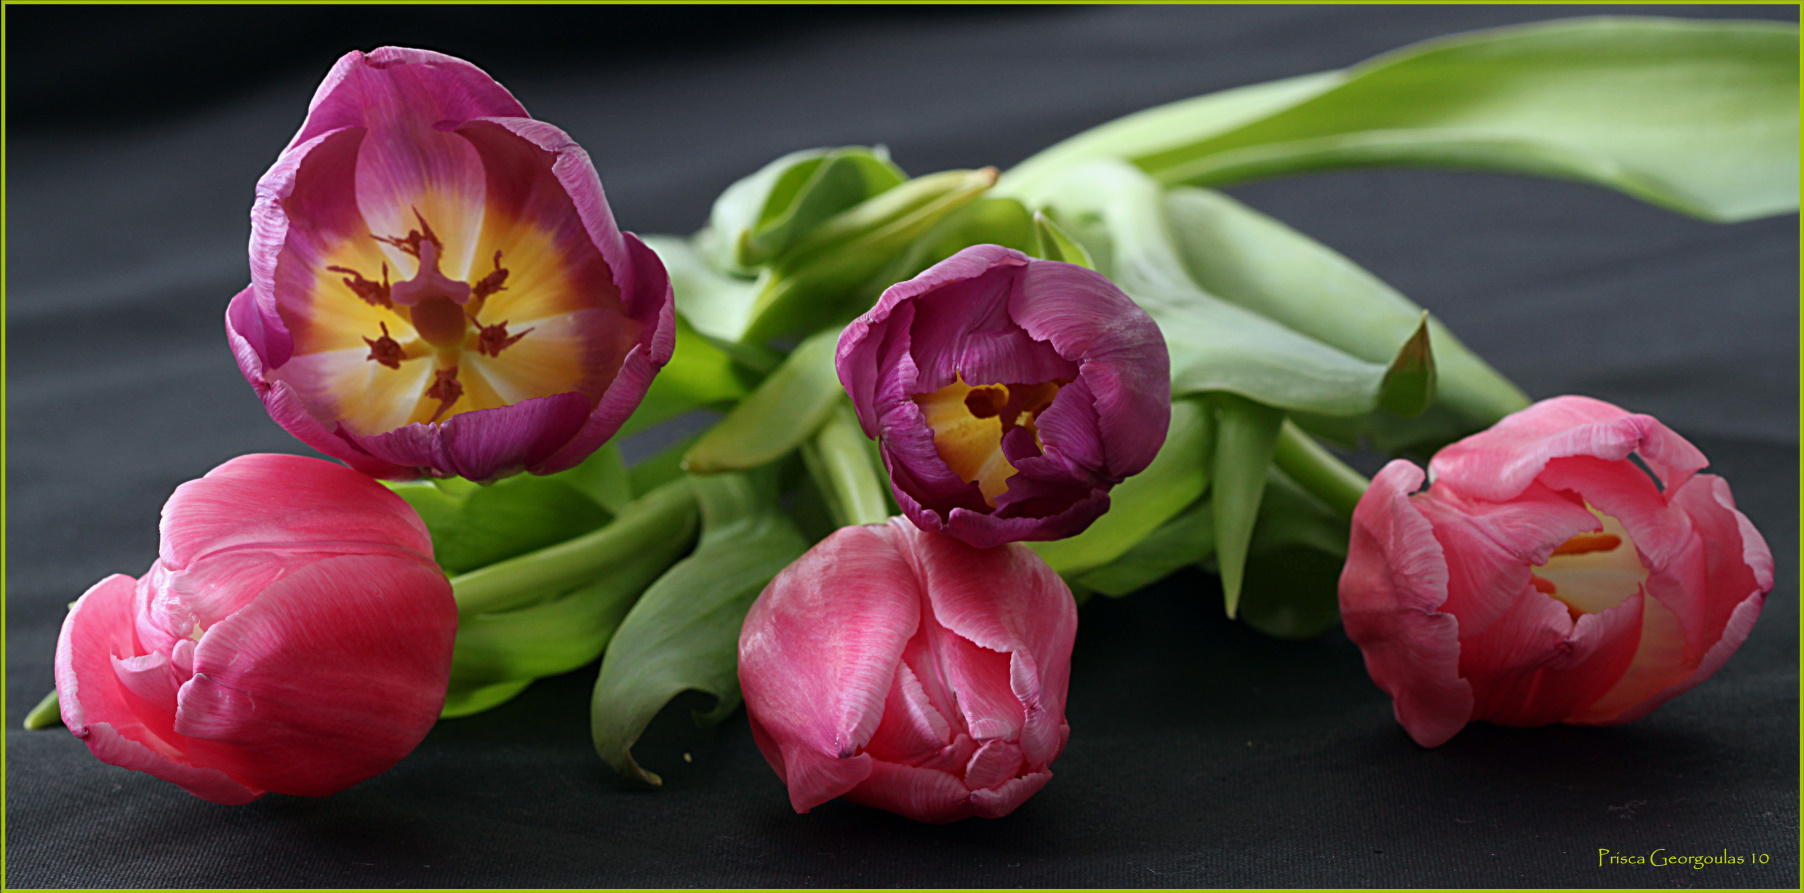 Der Frühling naht - Tulpenharmonie